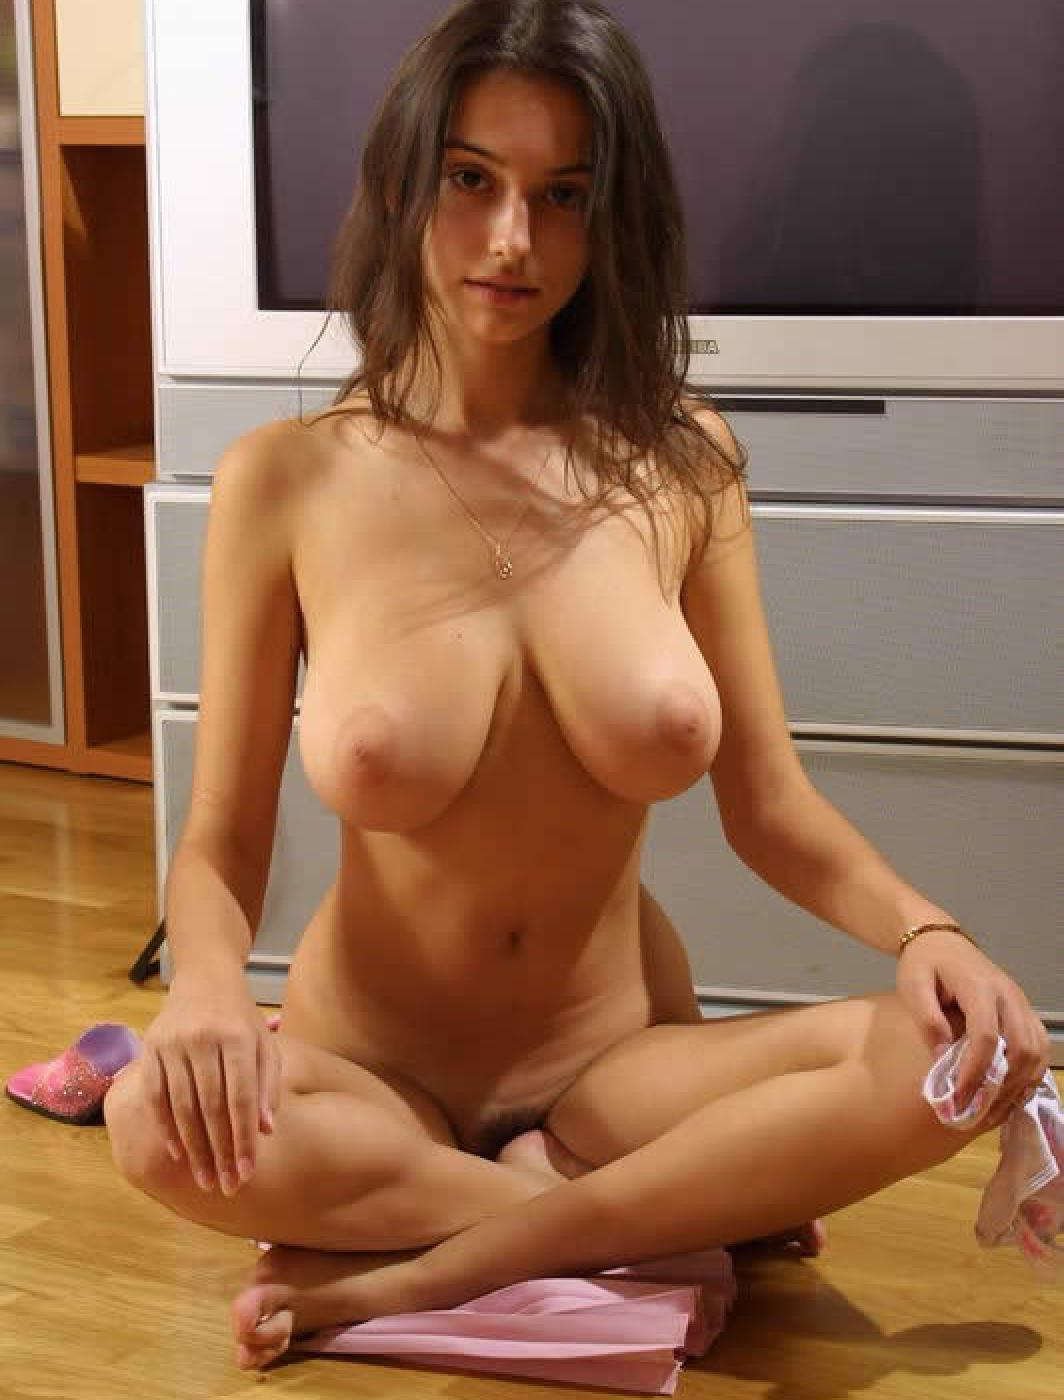 Boobs Larsa Pippen nudes (78 photos), Pussy, Paparazzi, Feet, legs 2017